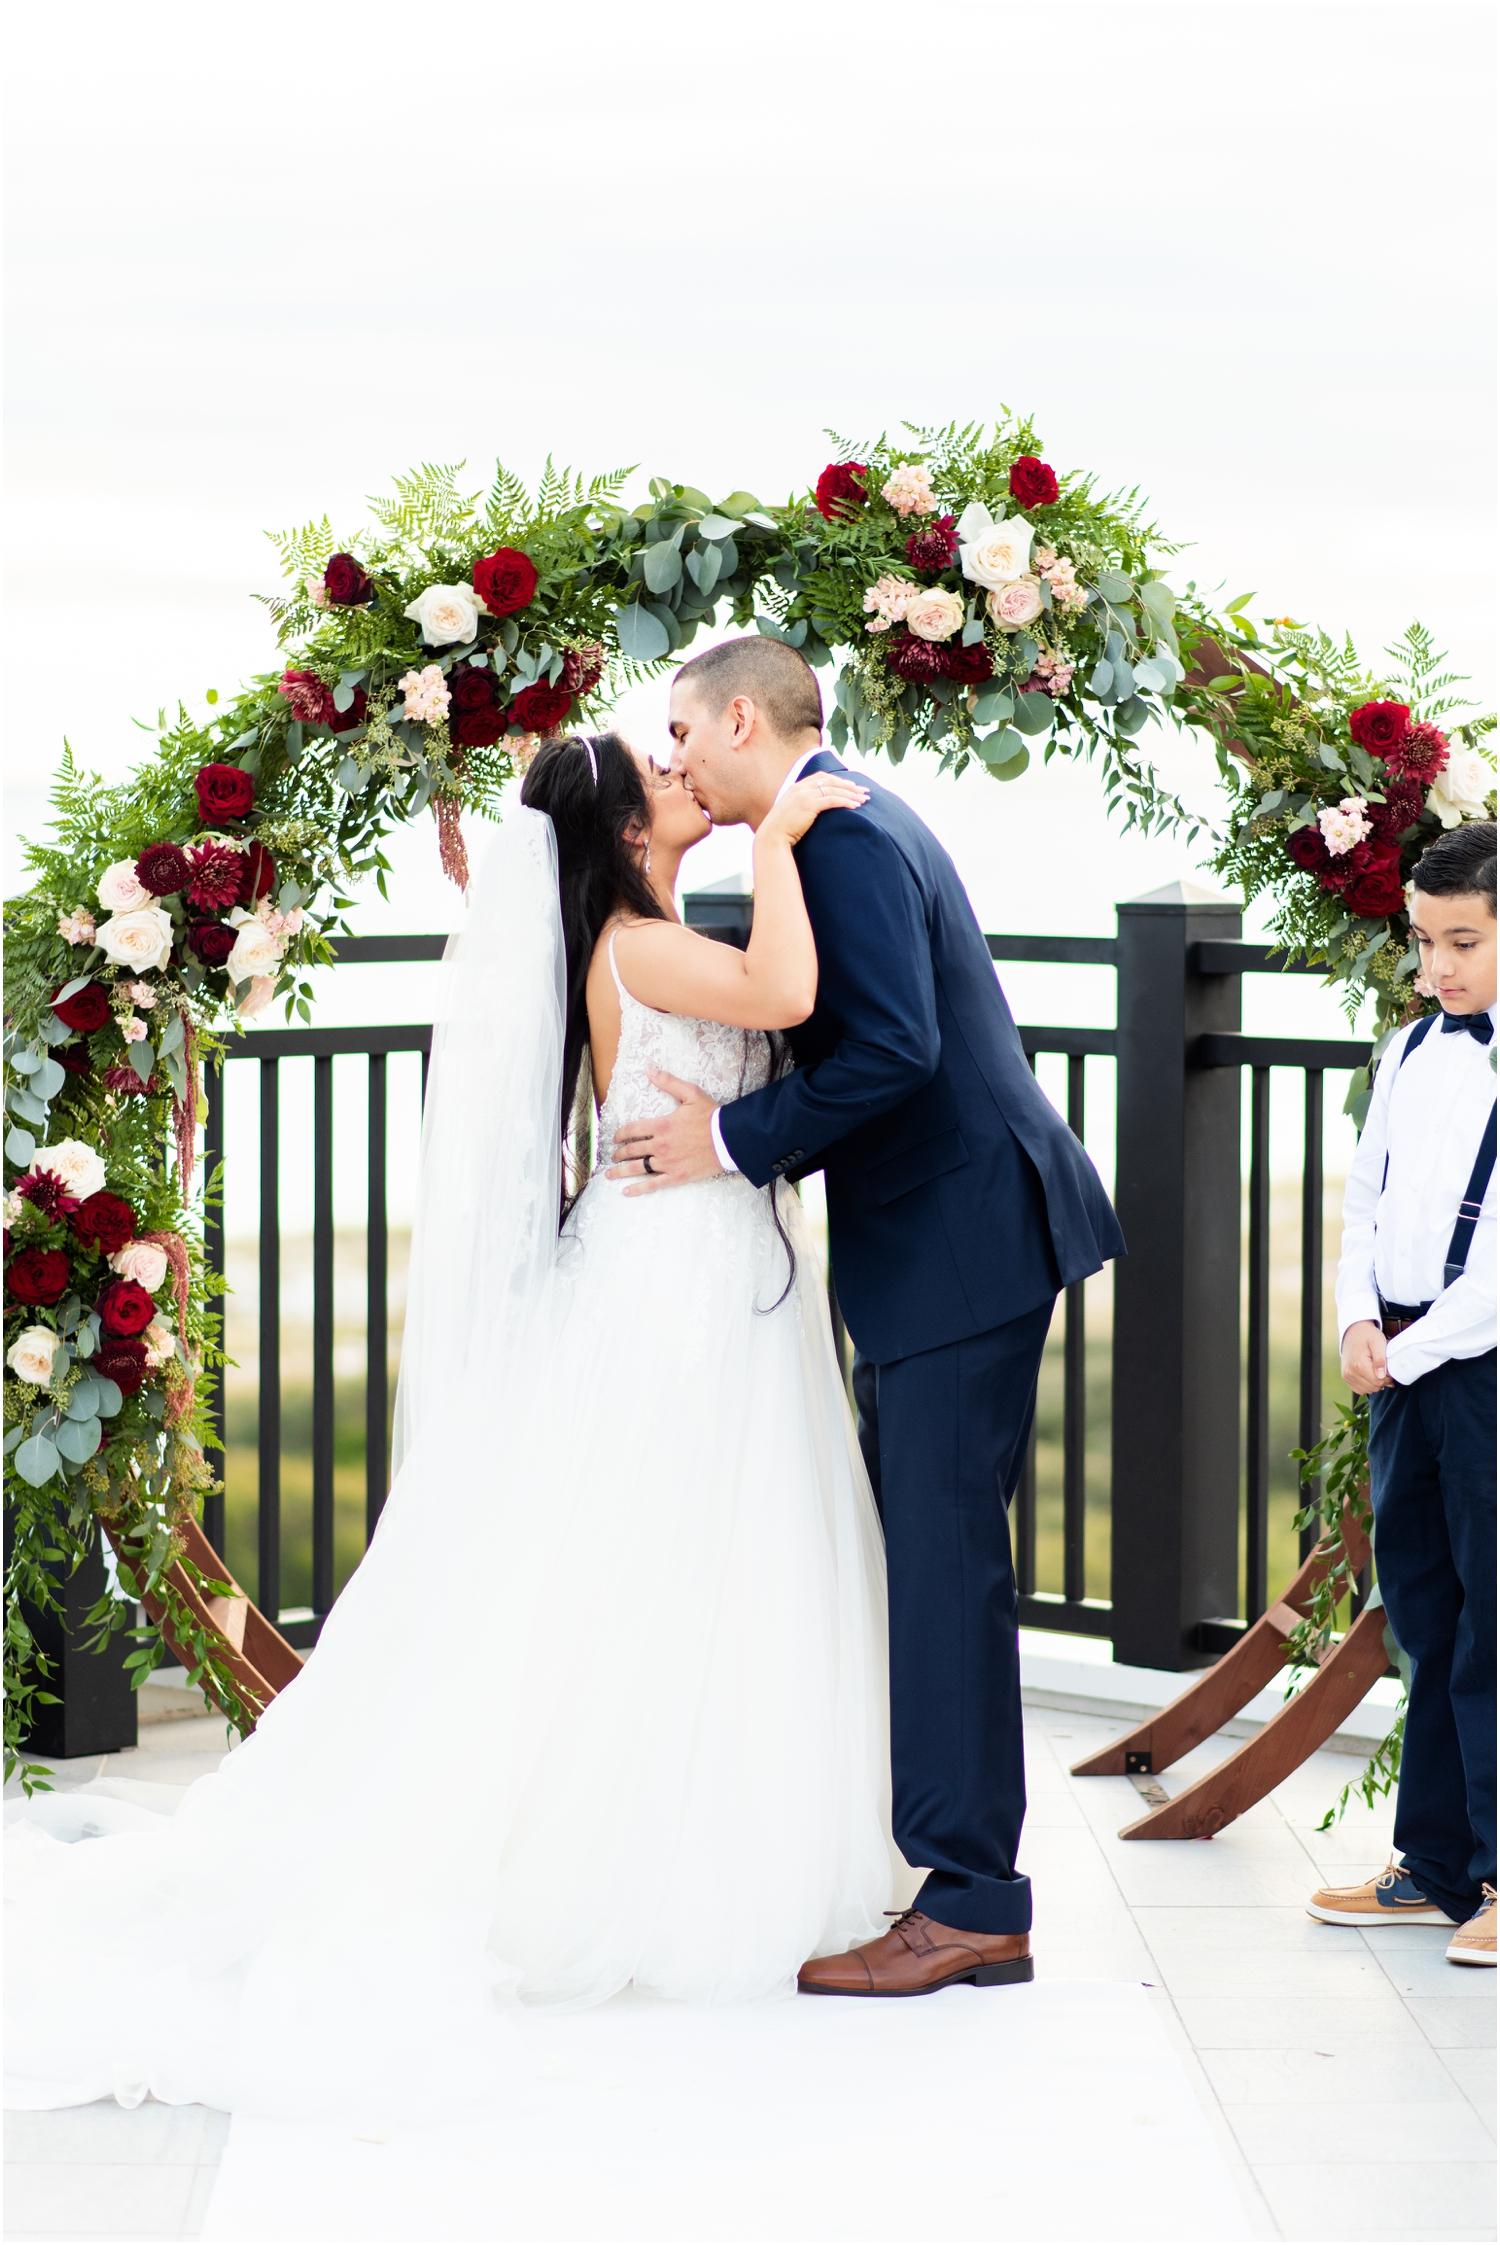 Henderson Beach Resort Inn Destin Florida Wedding Photographer rooftop ceremony